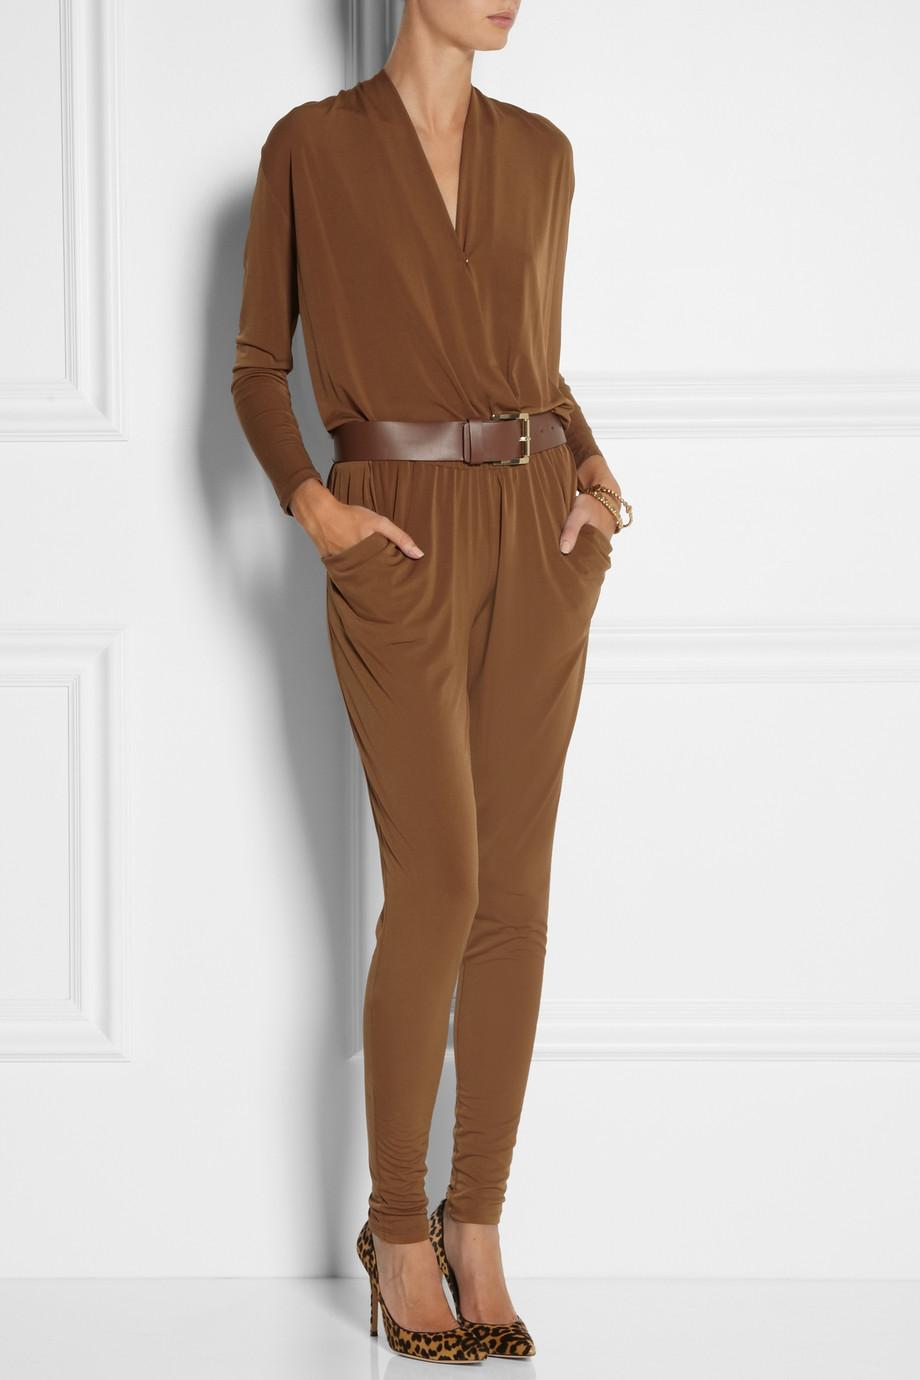 Michael Kors Jeans Women